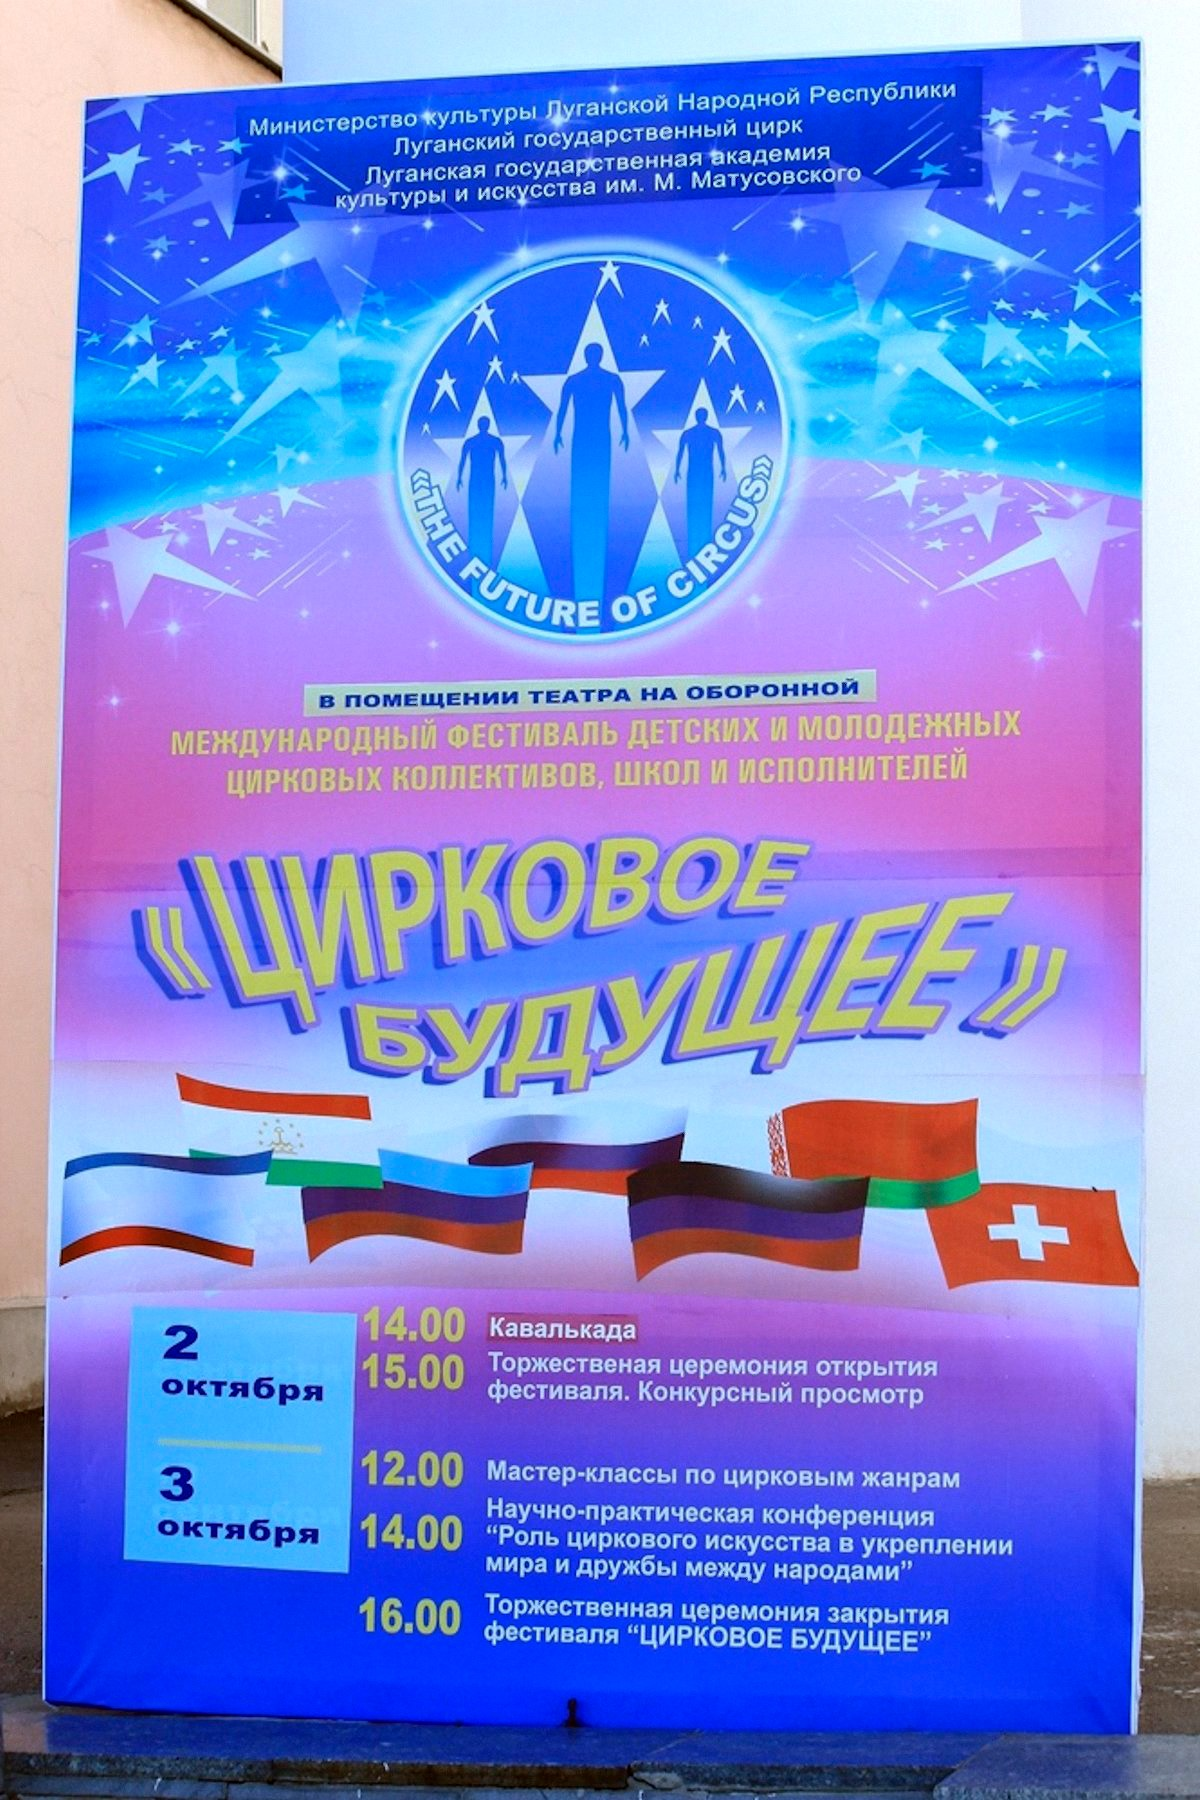 00 lnr lugask pr circus of the future 02 041015